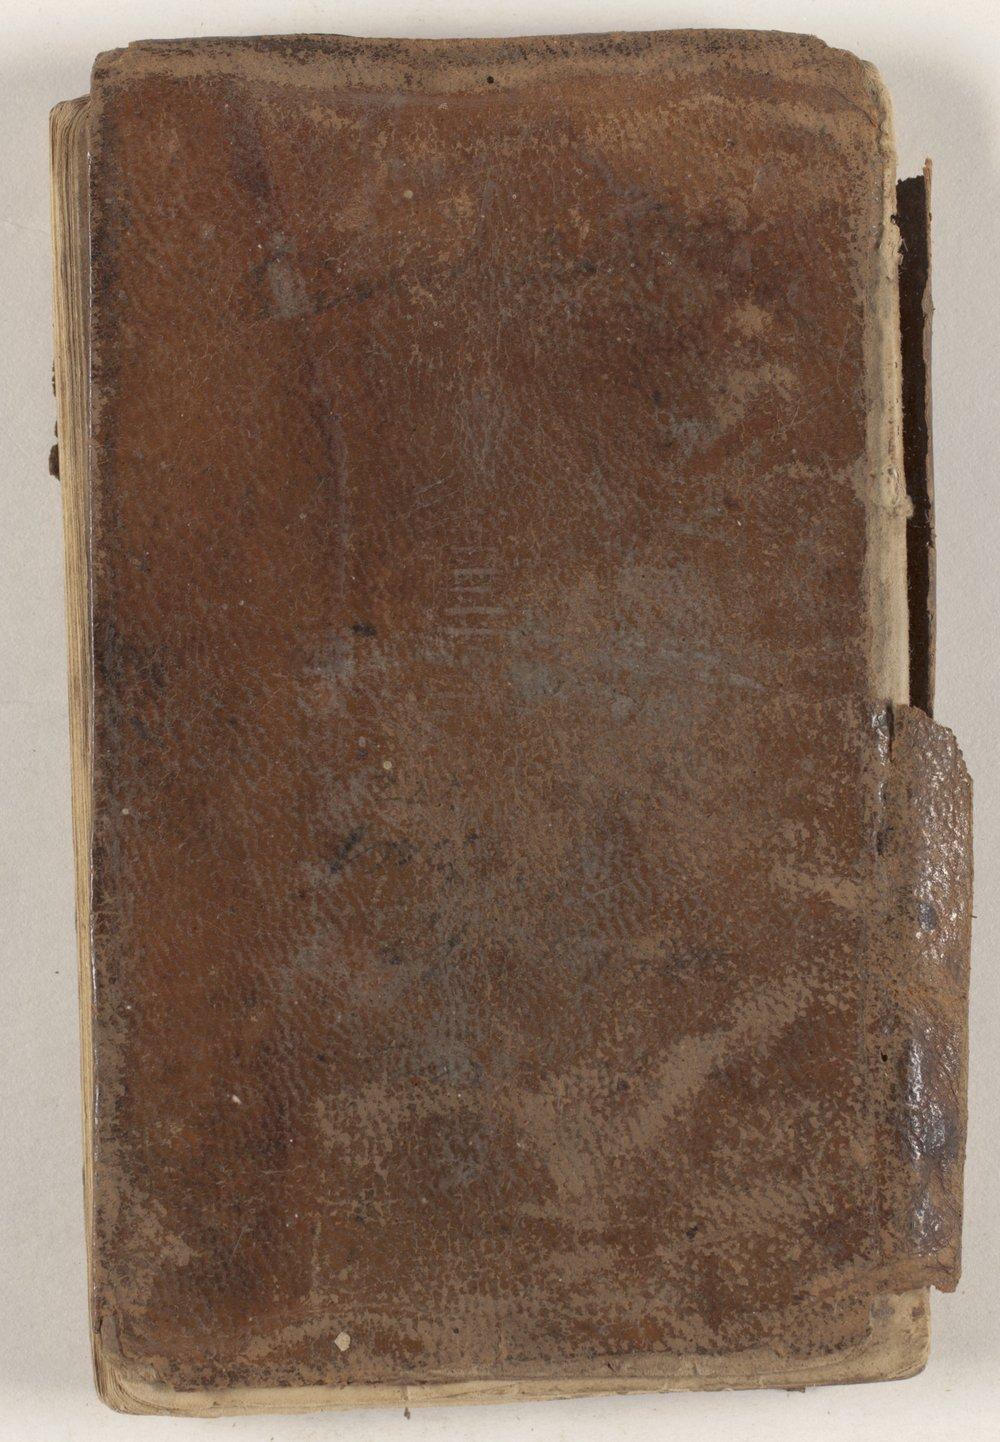 James McBride Gaston collection - Back cover